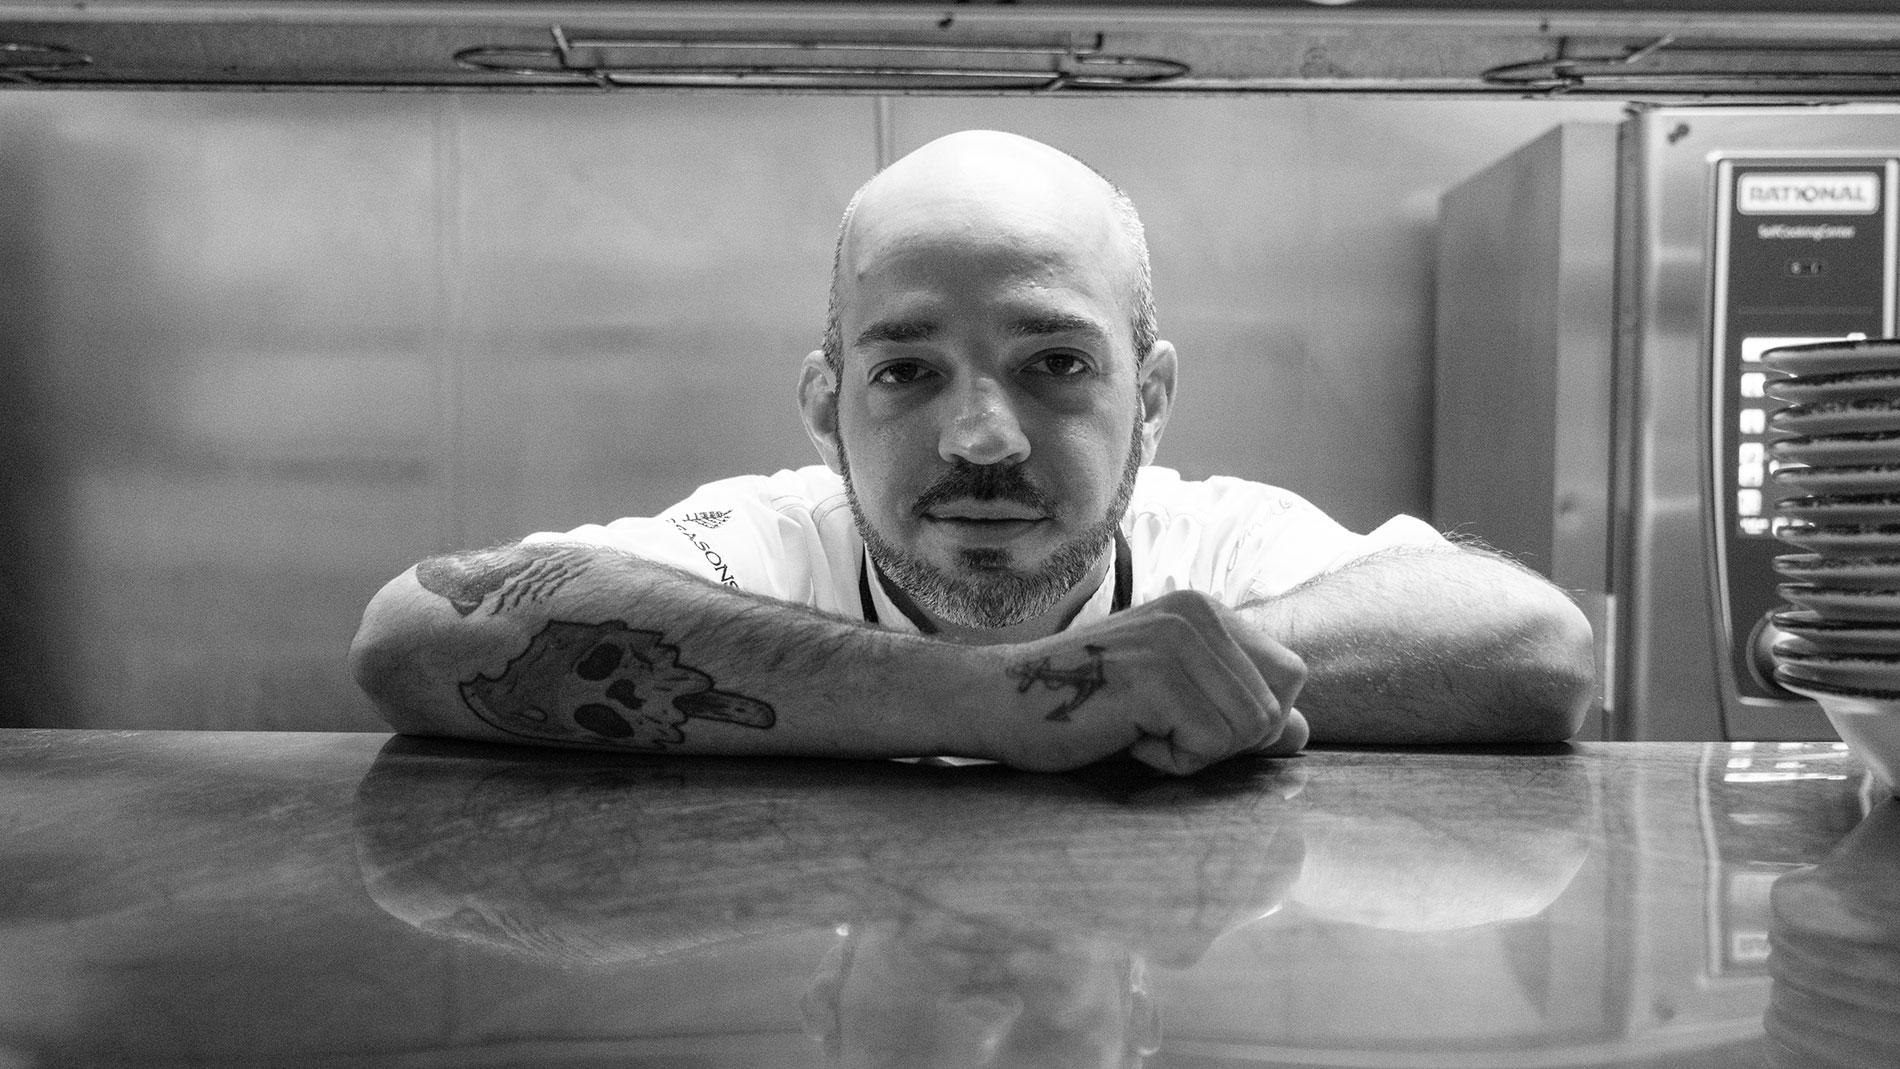 cinder house chef de cuisine peter slay